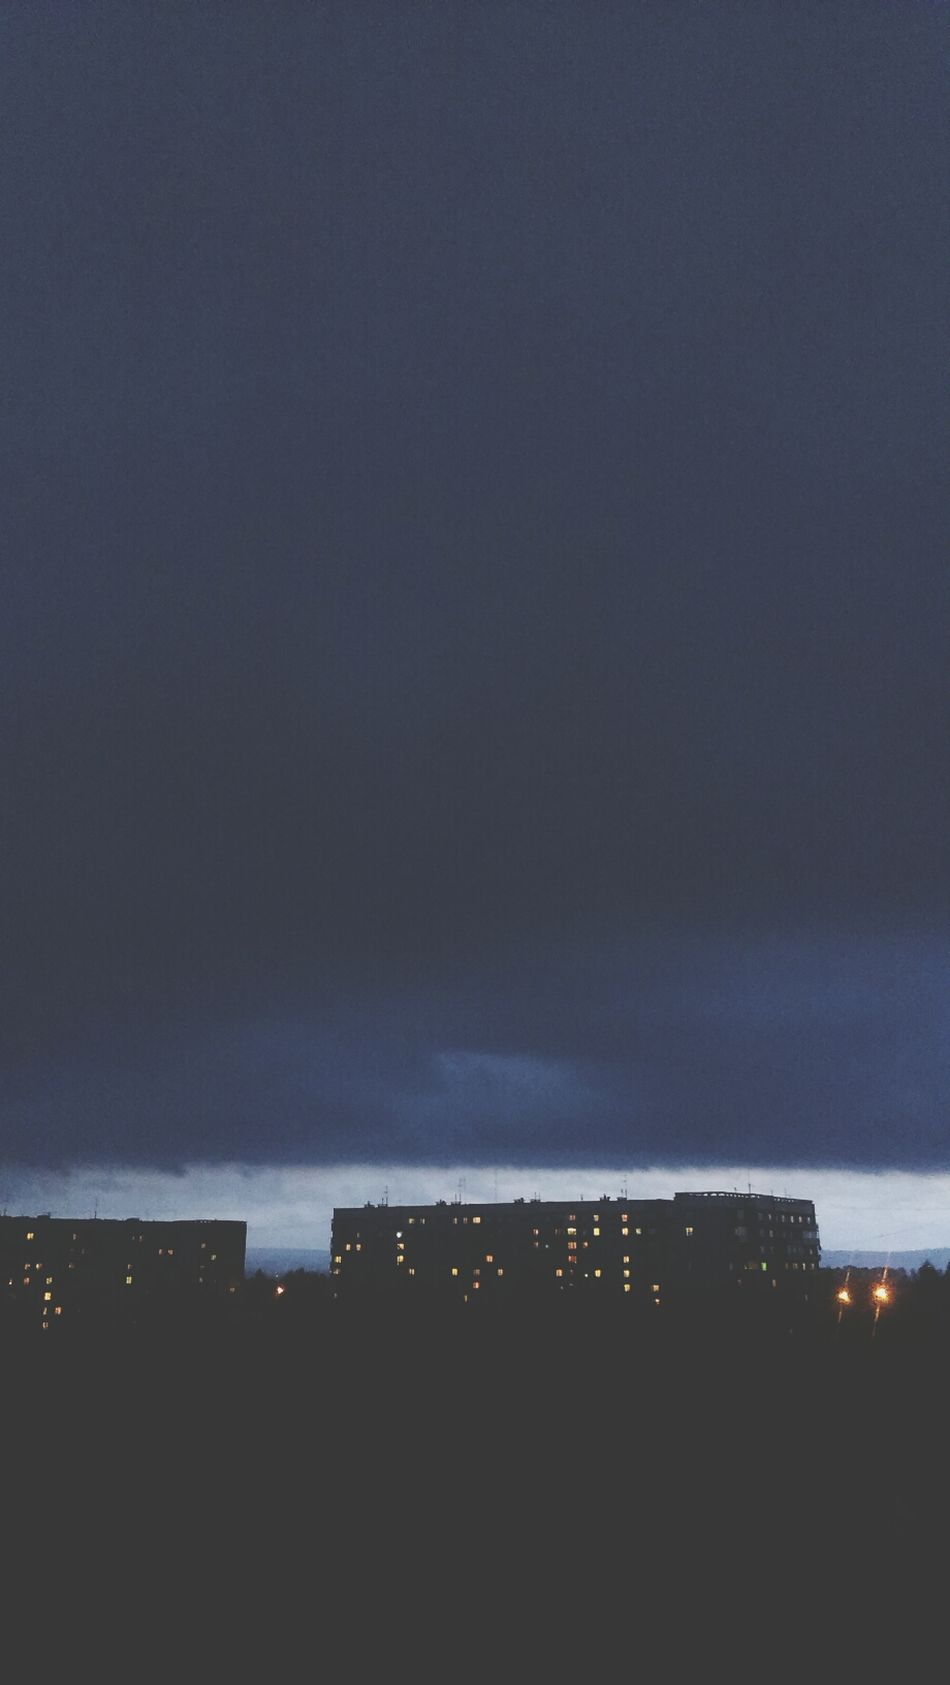 Послегрозозовое небо. First Eyeem Photo